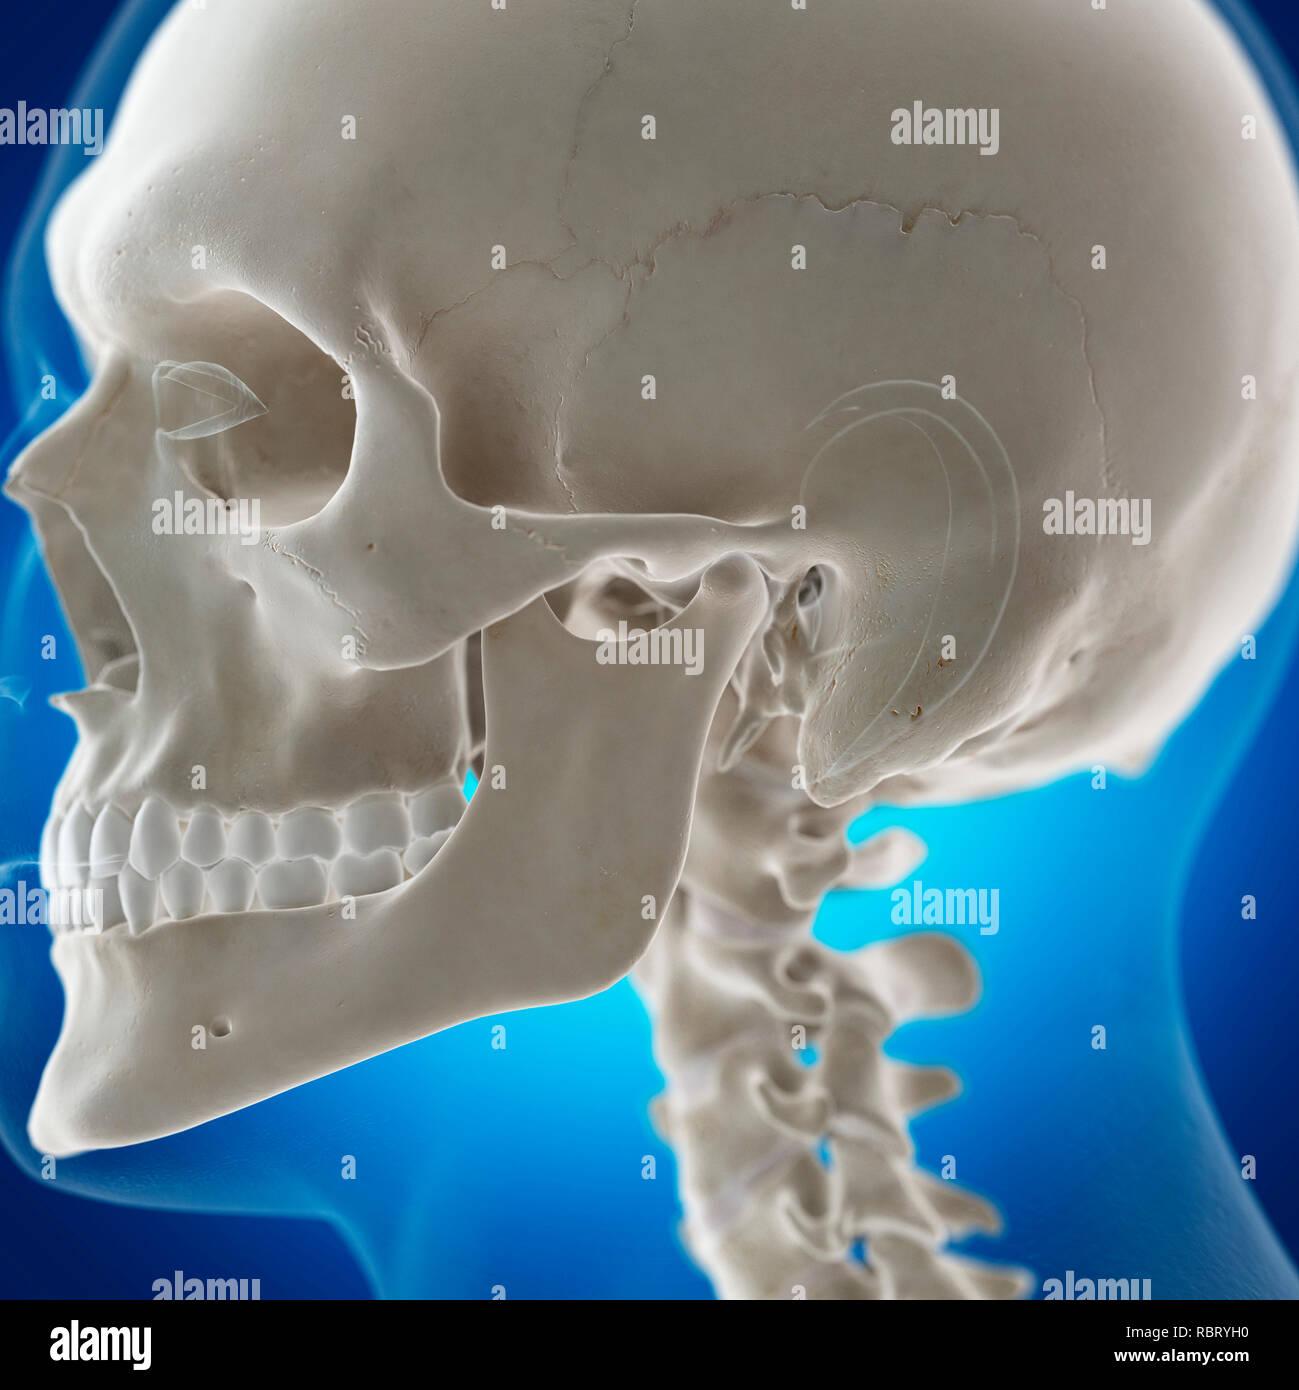 hight resolution of illustration of the temporomandibular joint stock image